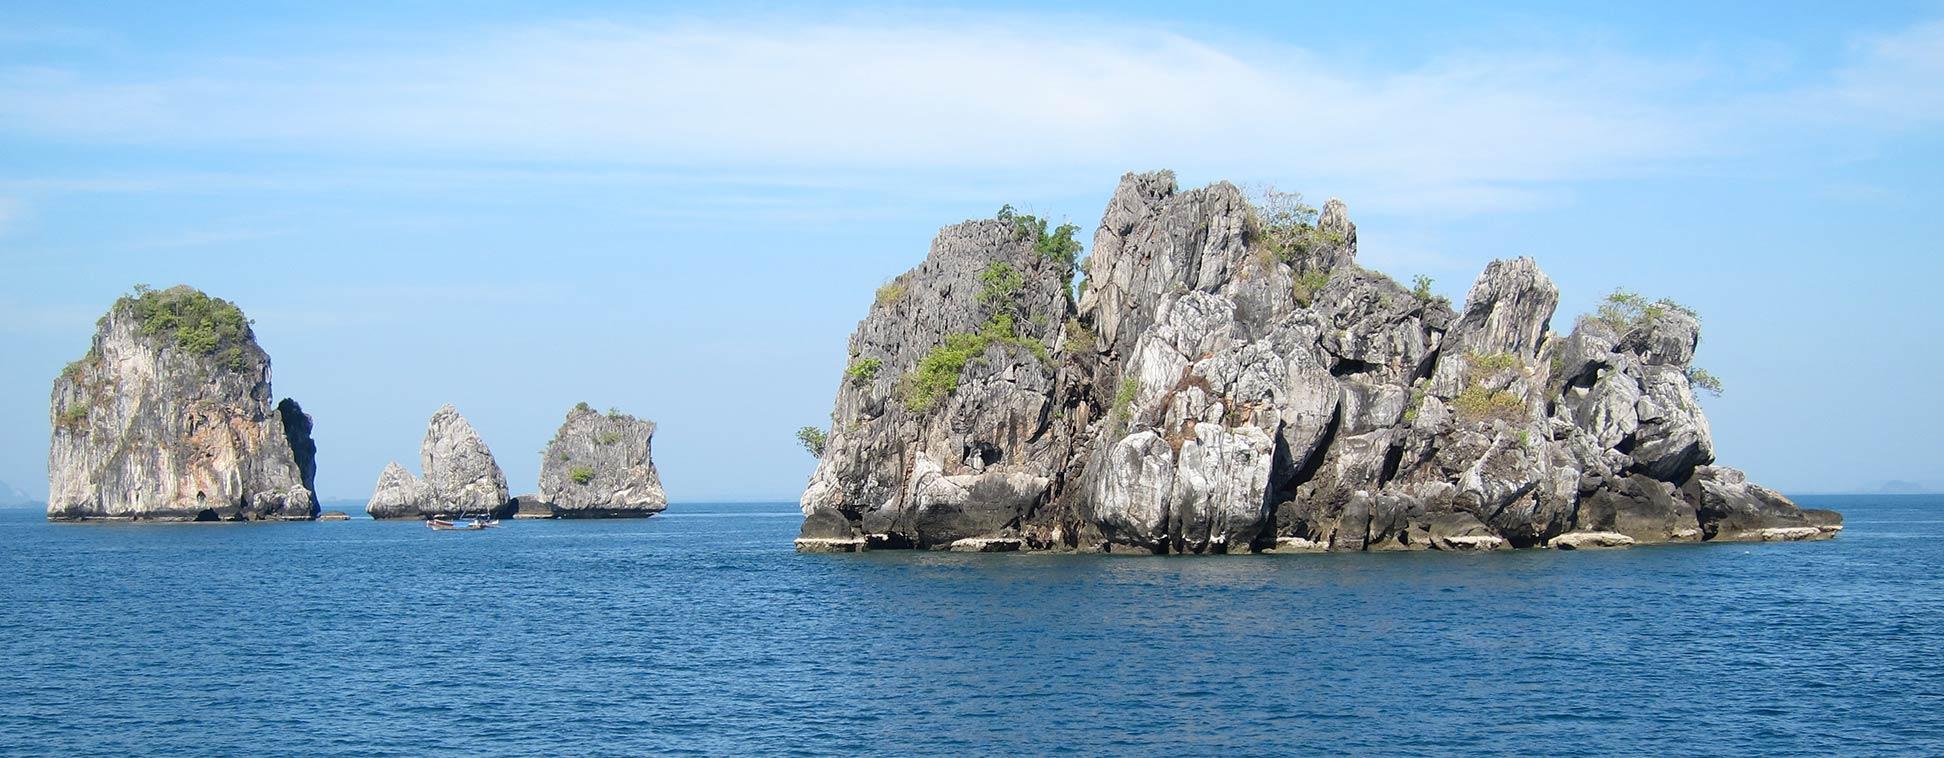 Google Map of Andaman and Nicobar Islands, India - Nations ... on